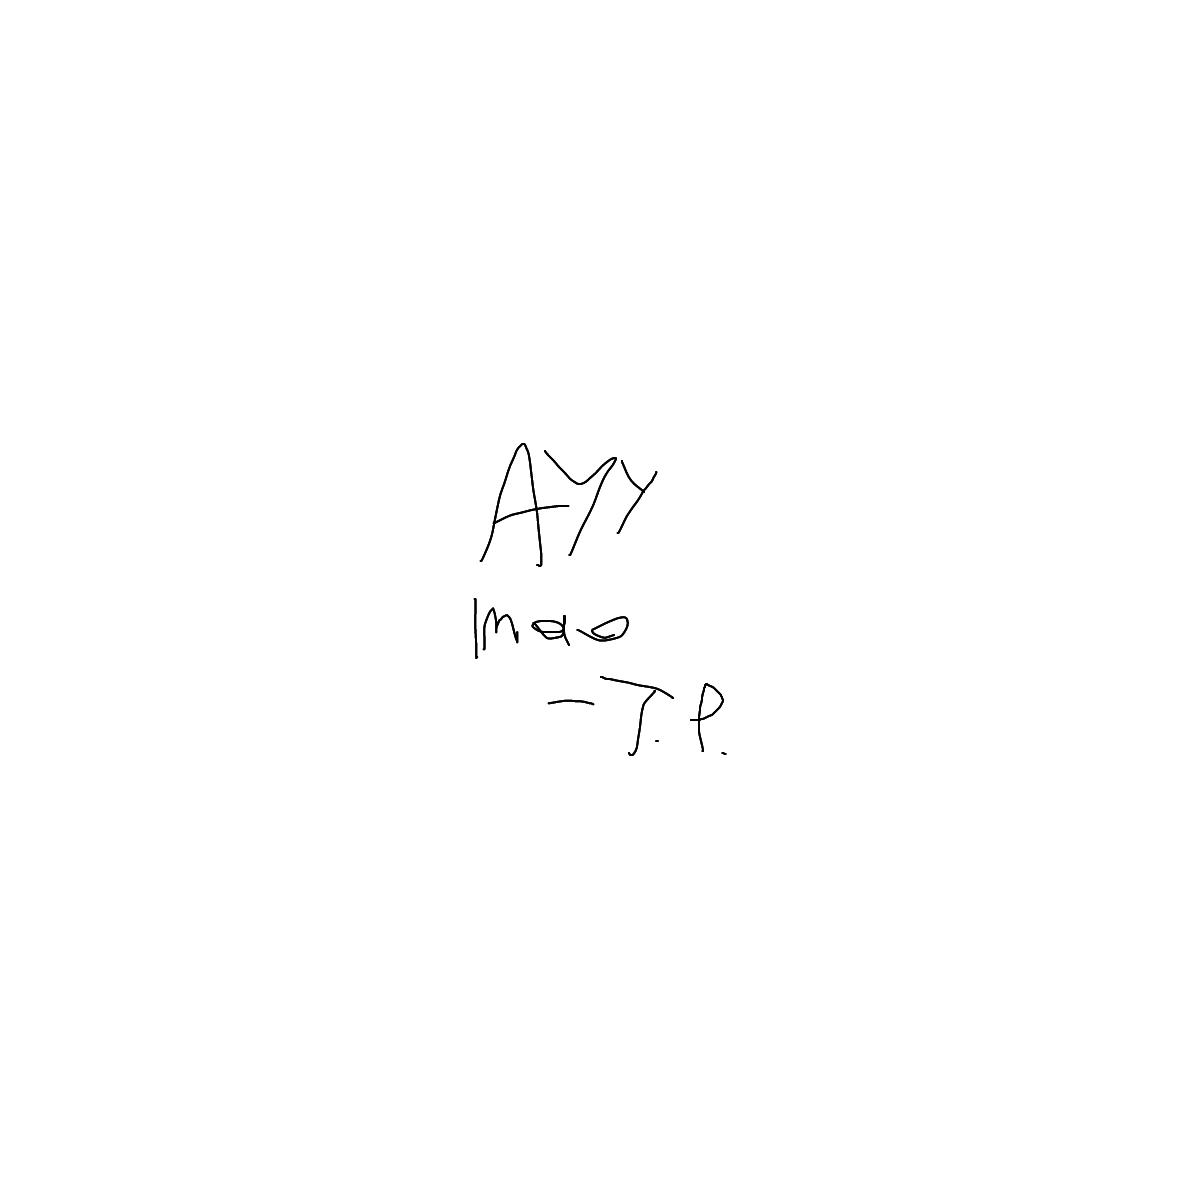 BAAAM drawing#3257 lat:49.1669006347656250lng: -122.8209838867187500